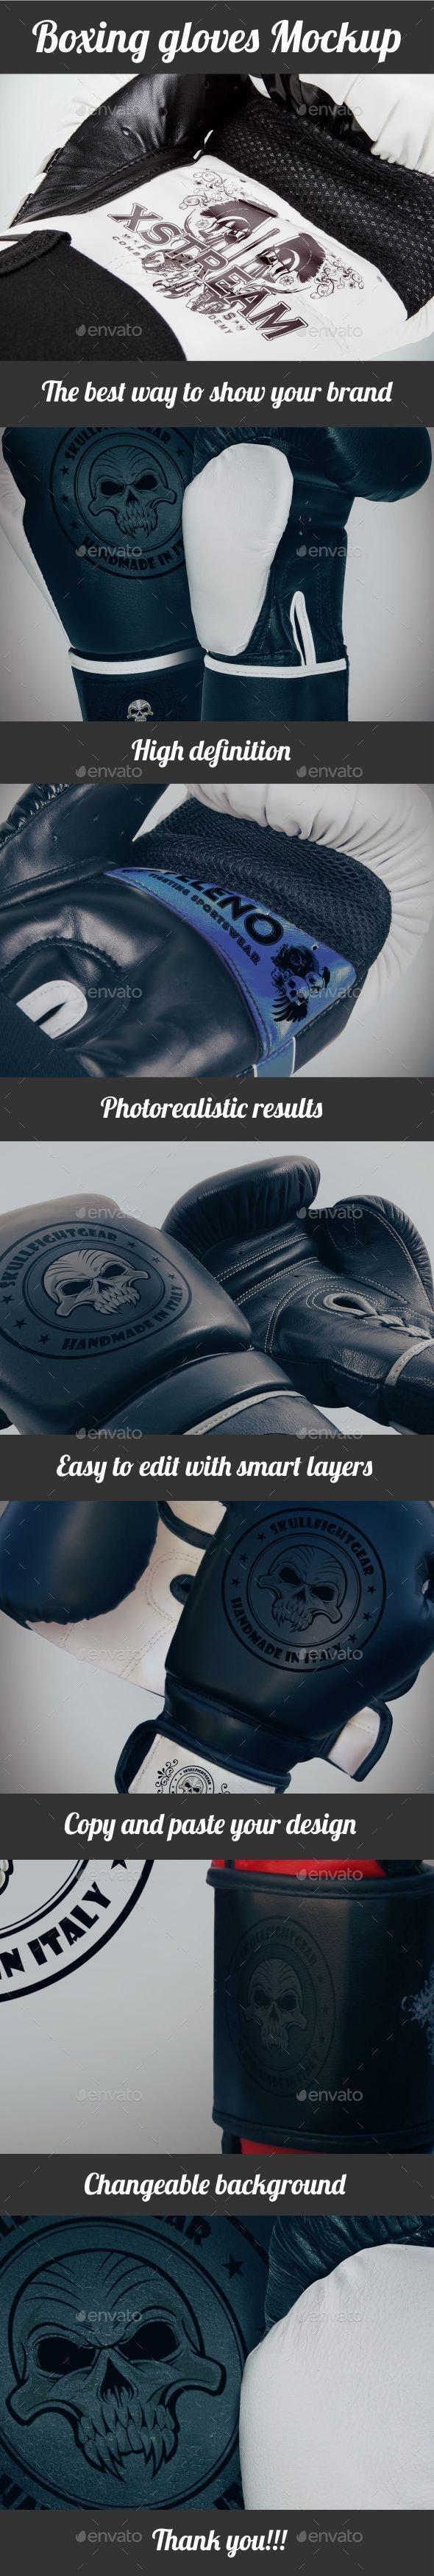 Boxing Gloves Mockup - Graphics